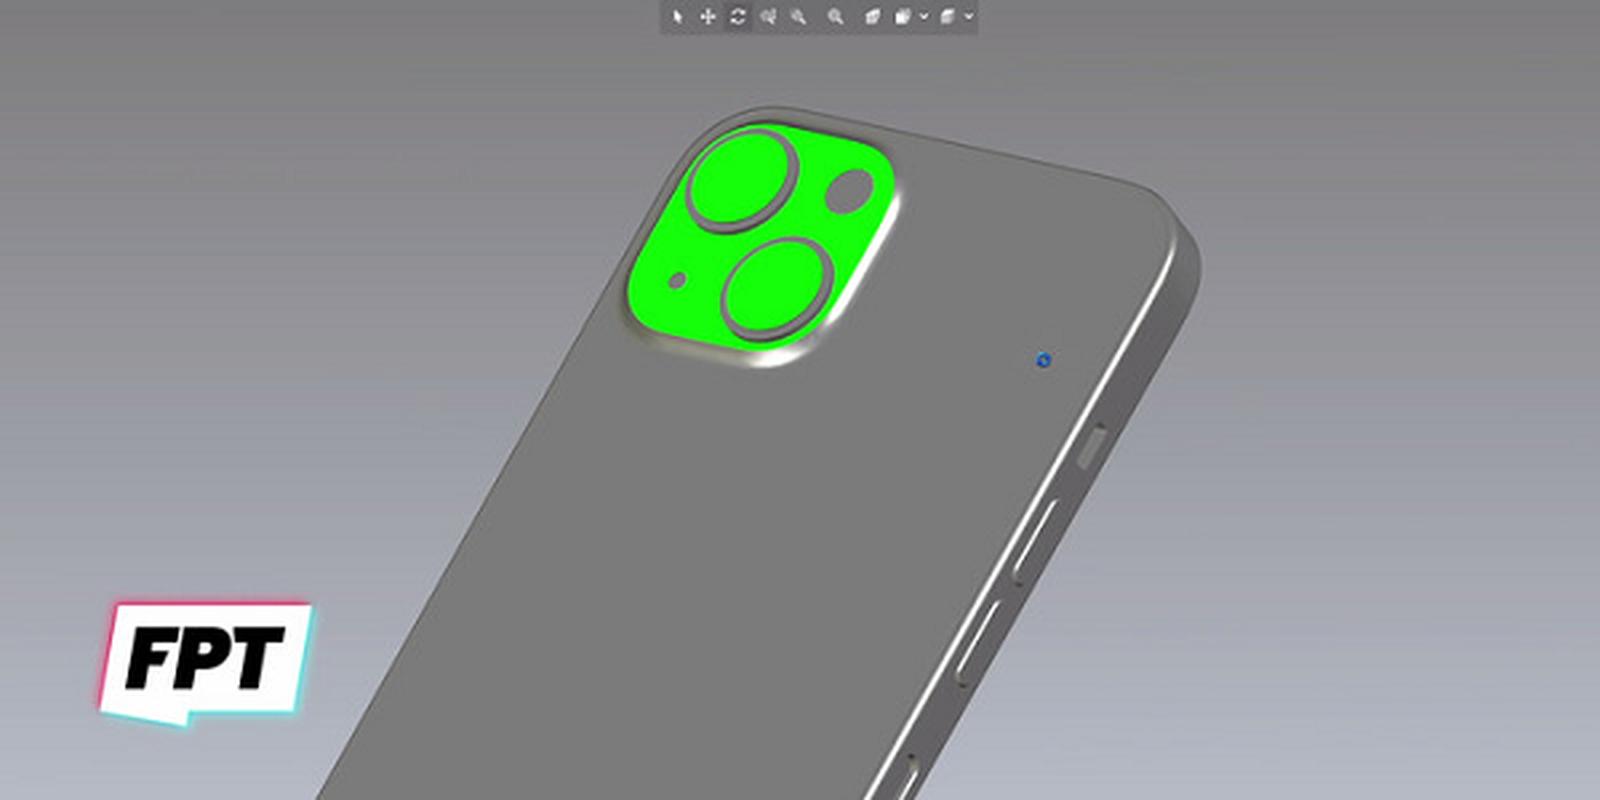 iPhone 13 bat ngo xuat hien mau cam dep la, camera xep cheo-Hinh-2